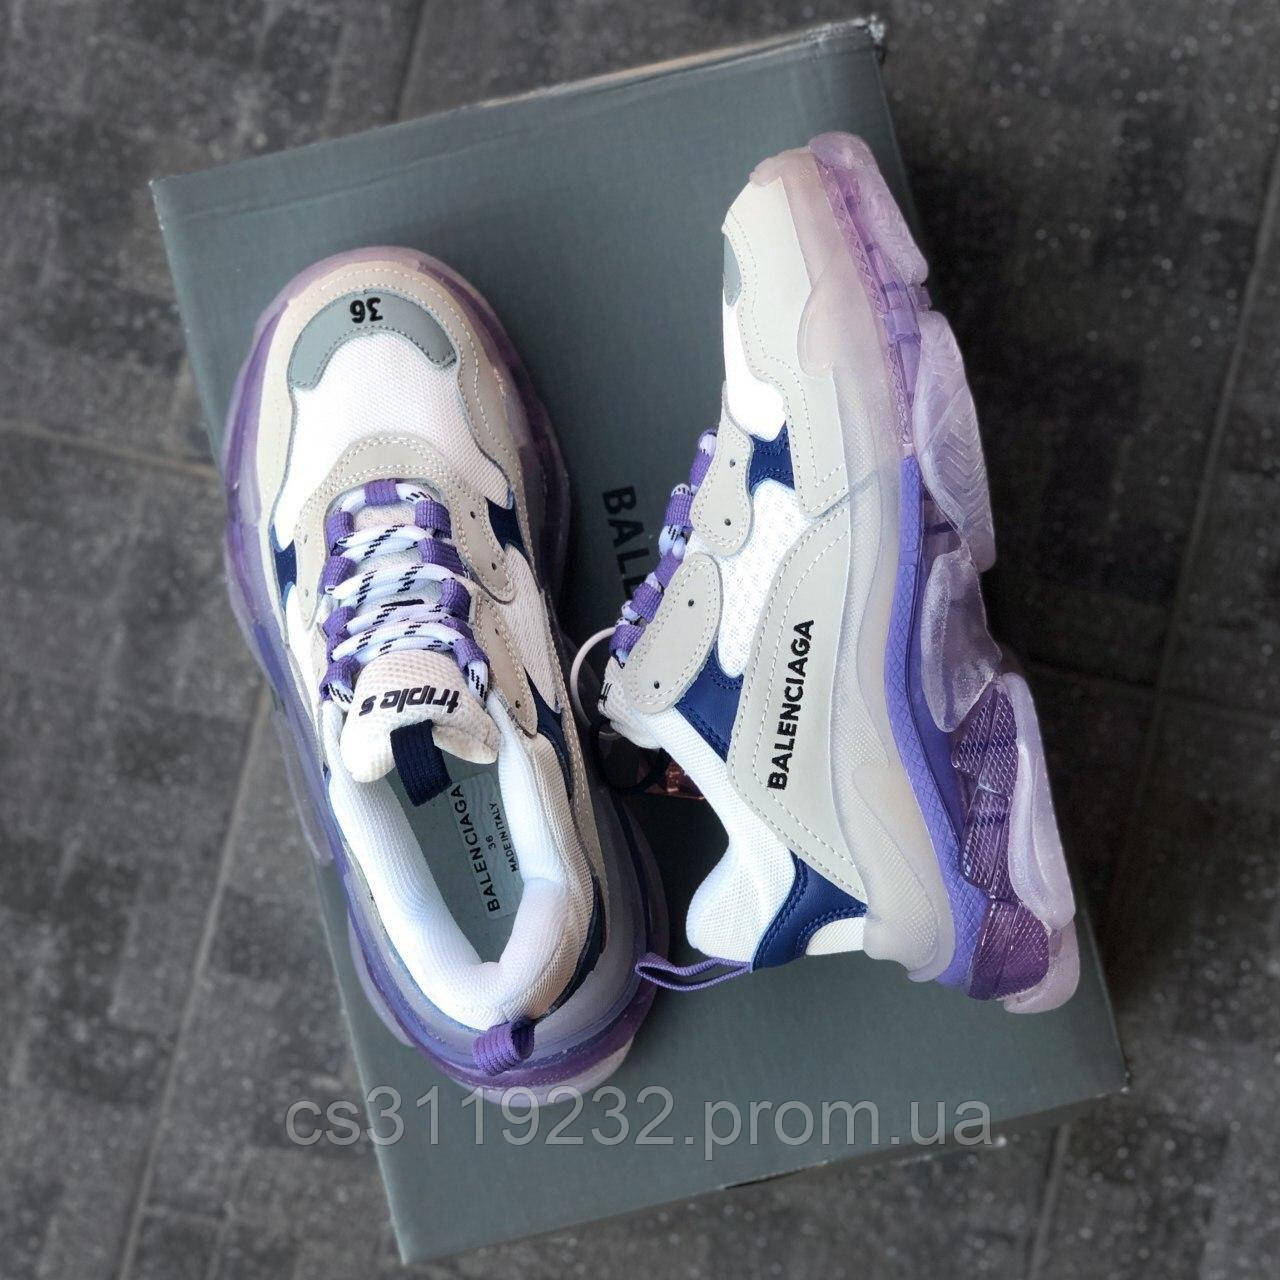 Жіночі кросівки Balenciaga Triple S Clear Sole Violet White (біло-фіолетові)